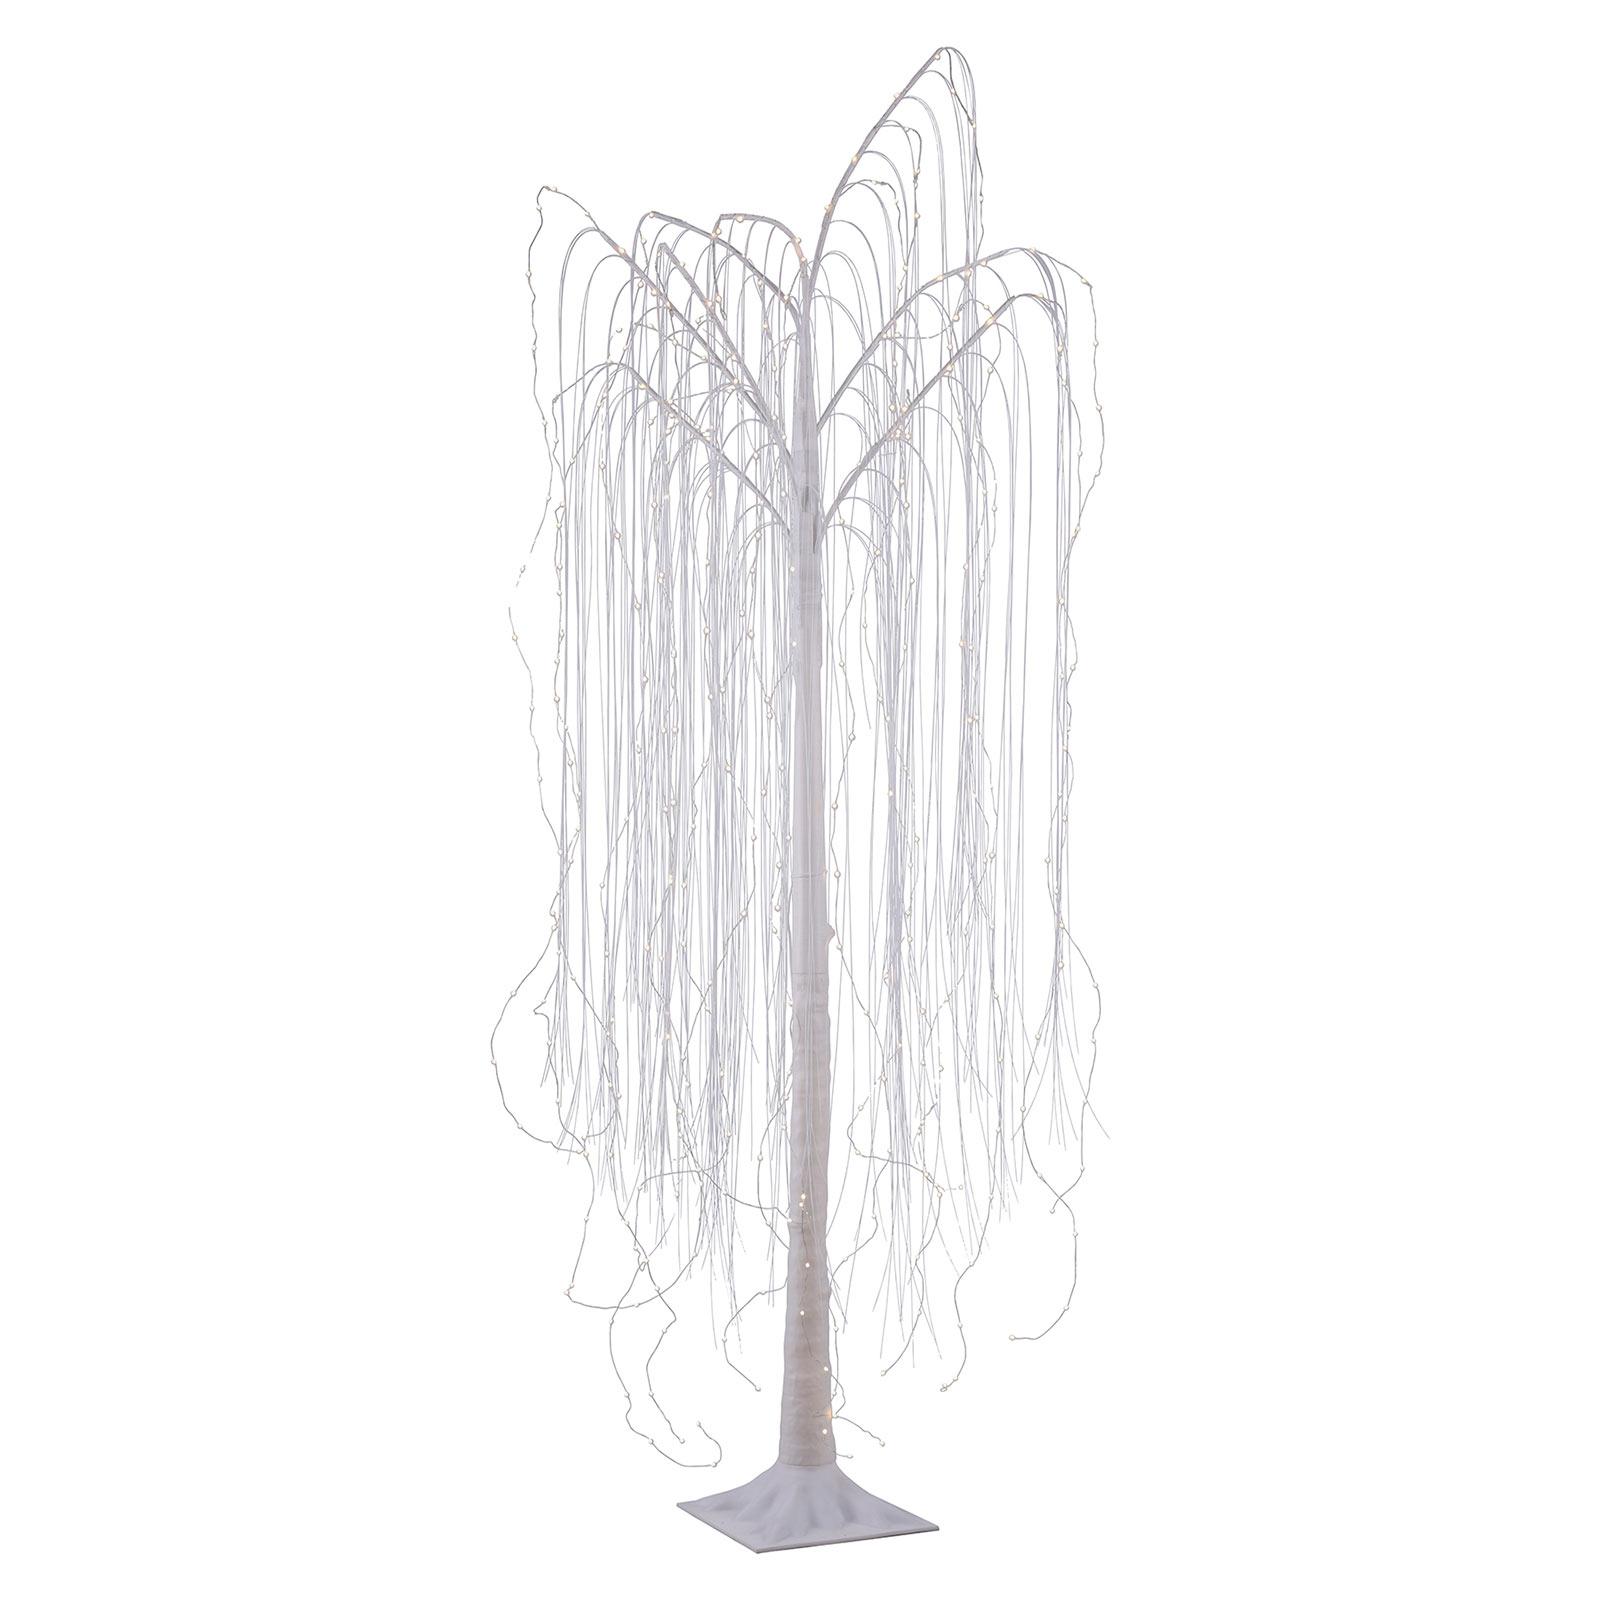 LED-dekorationslampa Willow, IP44, höjd 210 cm